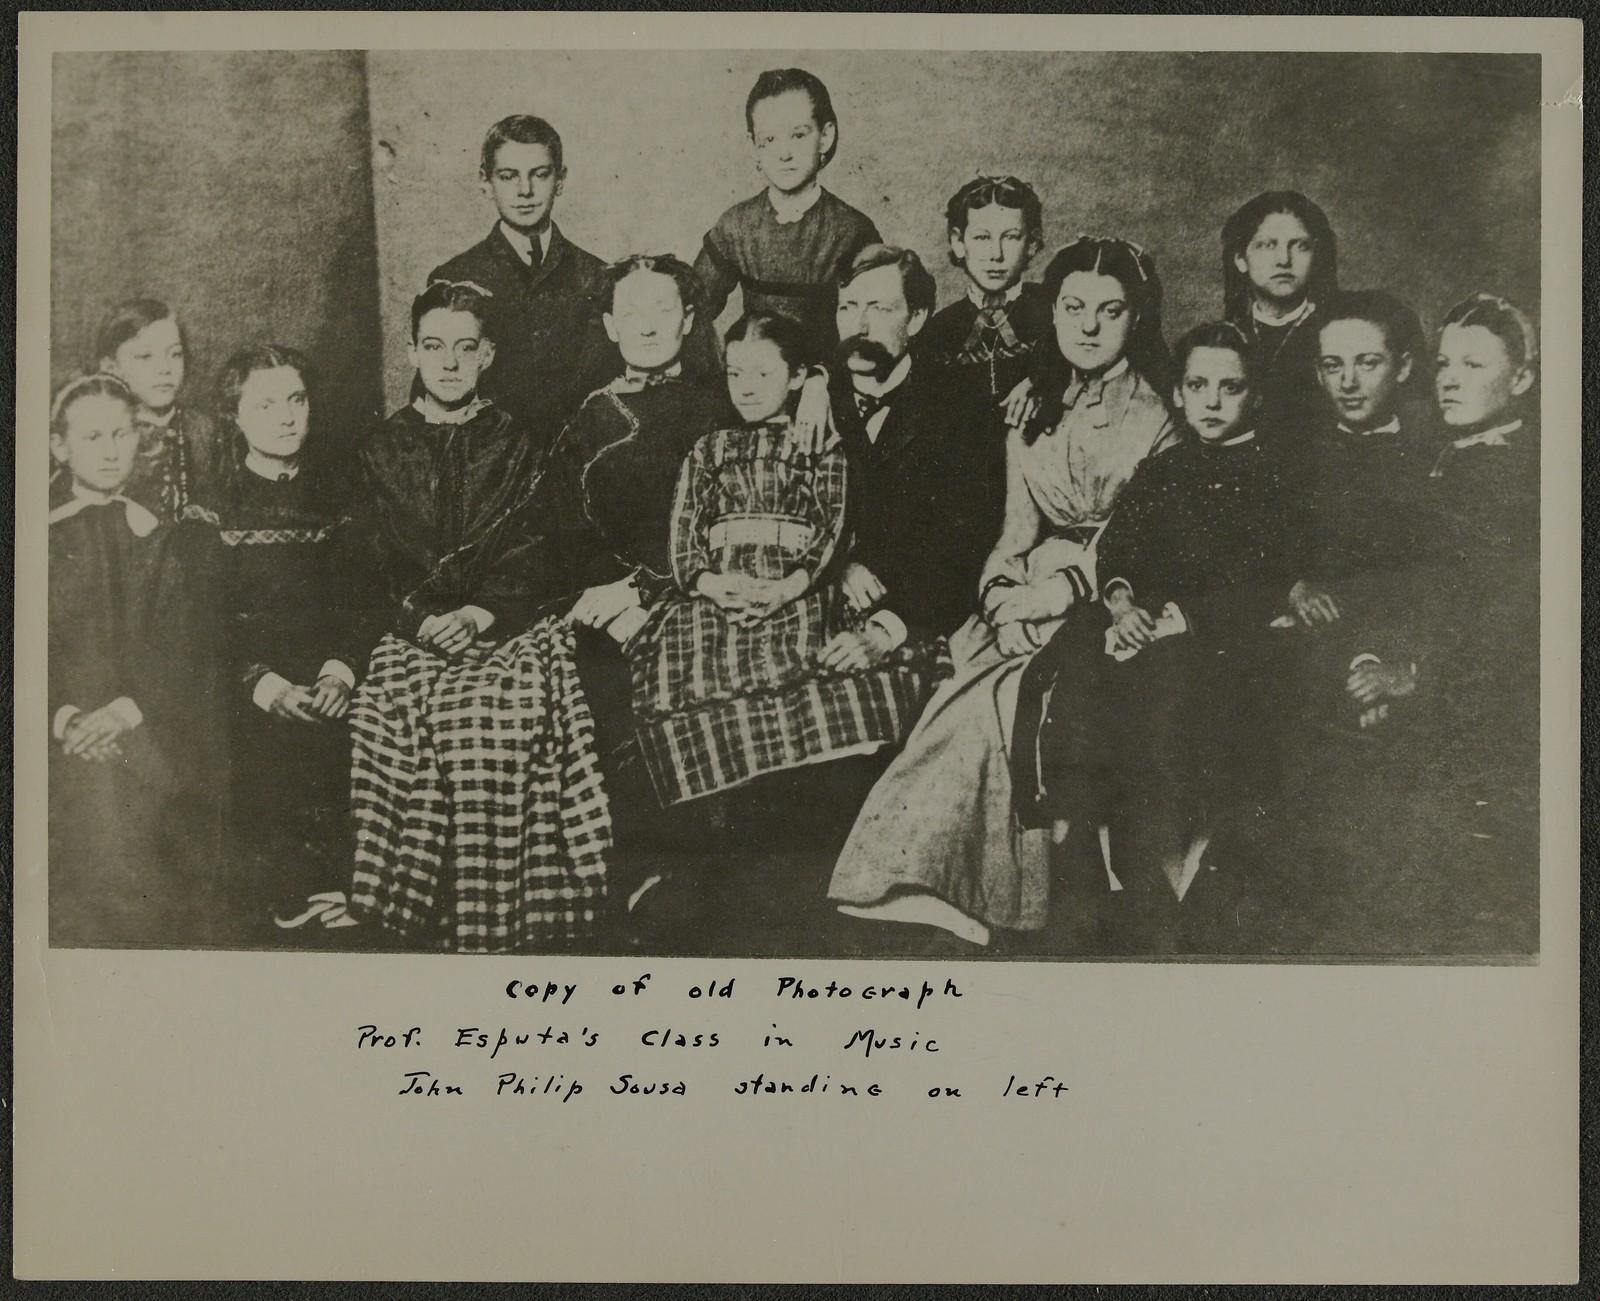 Professor John Esputa's music class, Sousa standing, back row on left